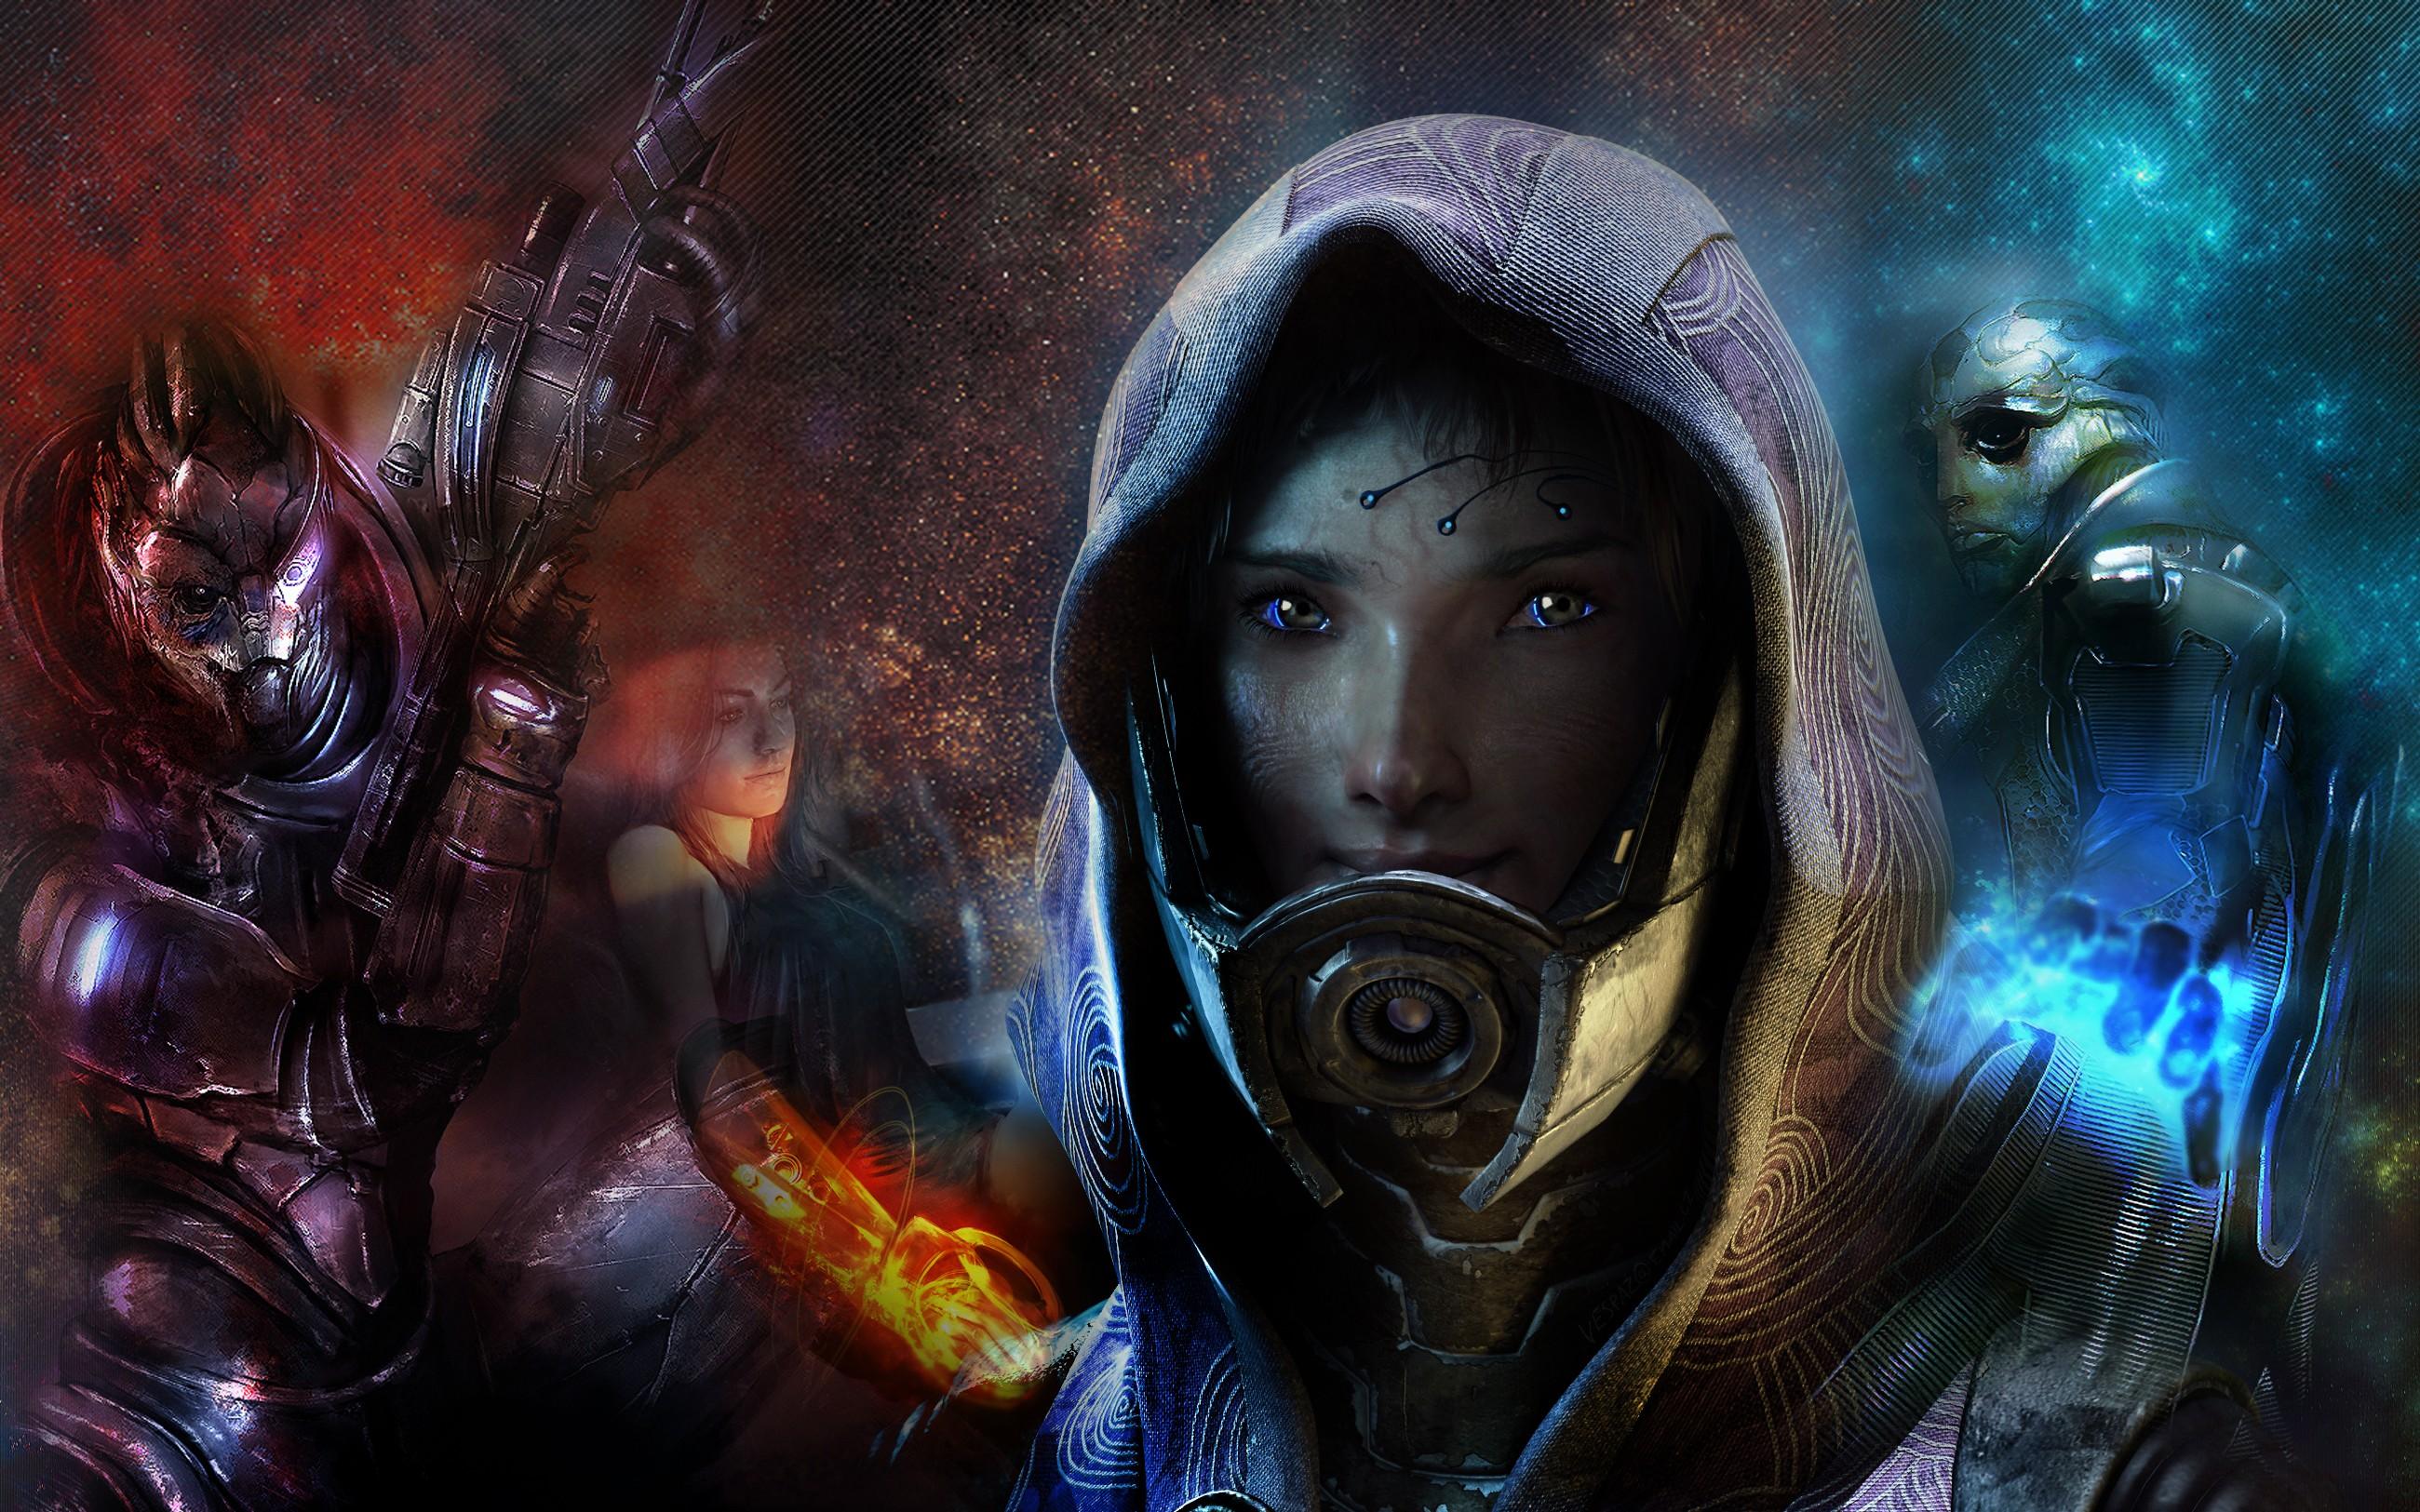 Video Game - Mass Effect 3  Garrus Vakarian Thane Krios Tali'Zorah Miranda Lawson Wallpaper